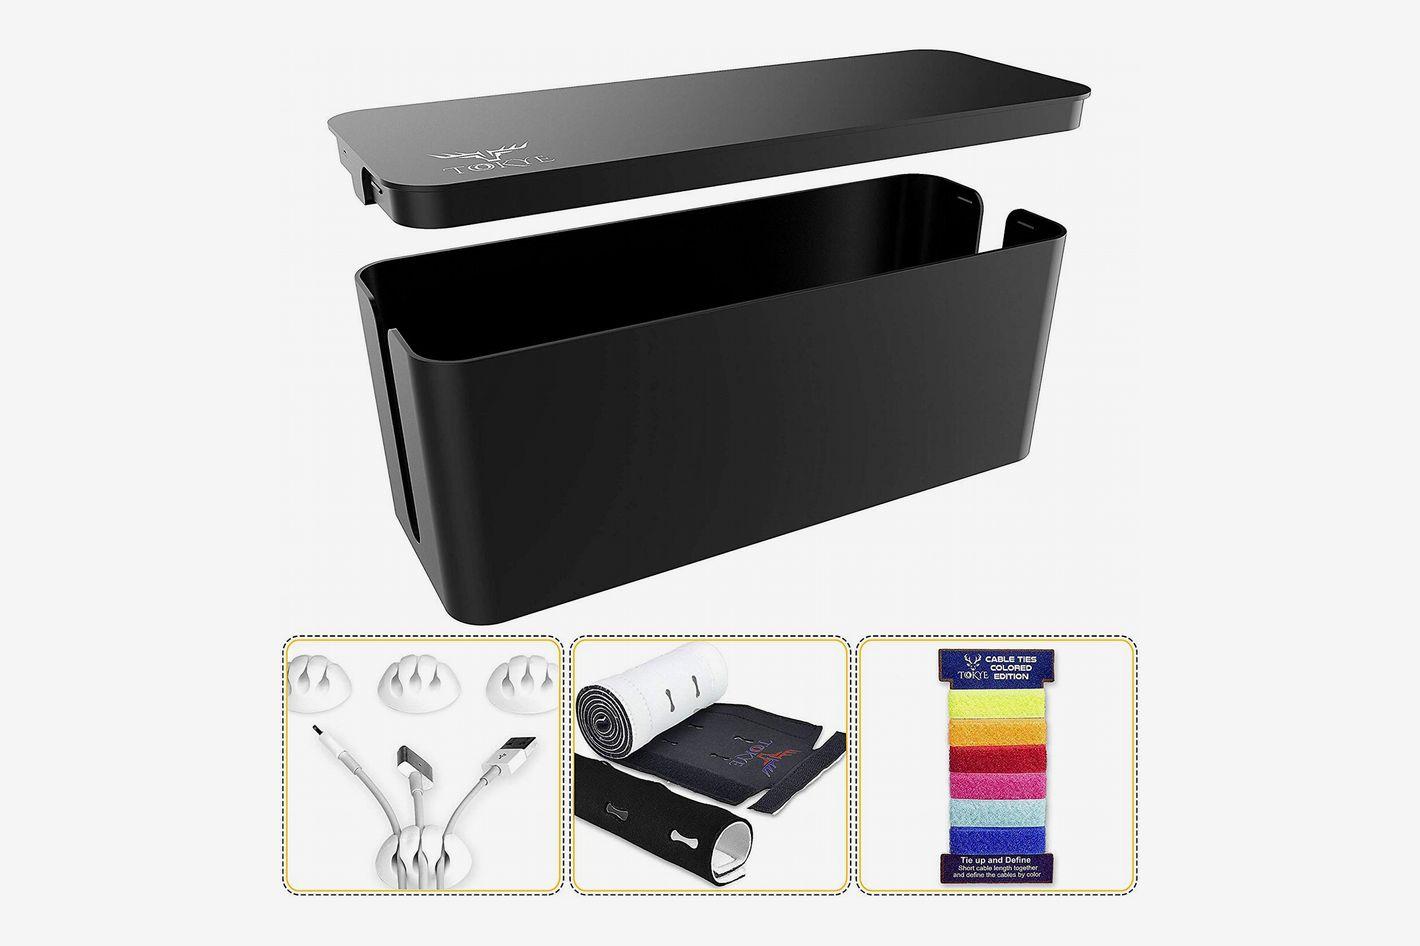 Tokye Cable Organizer Kit